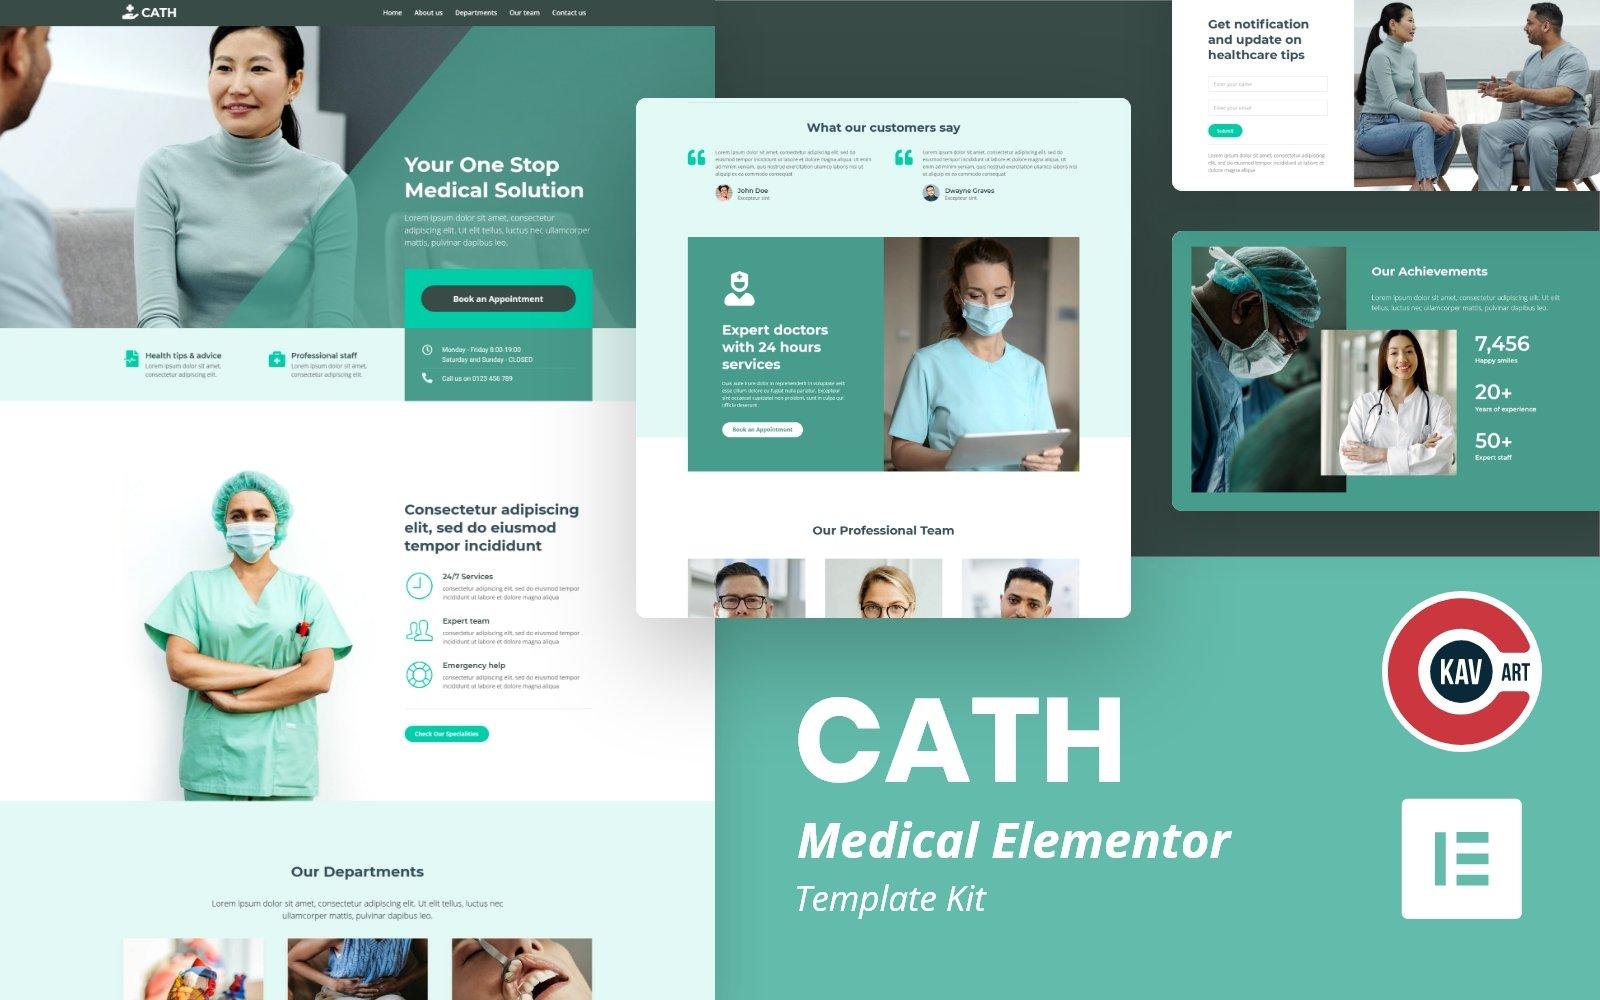 Elementor Kits